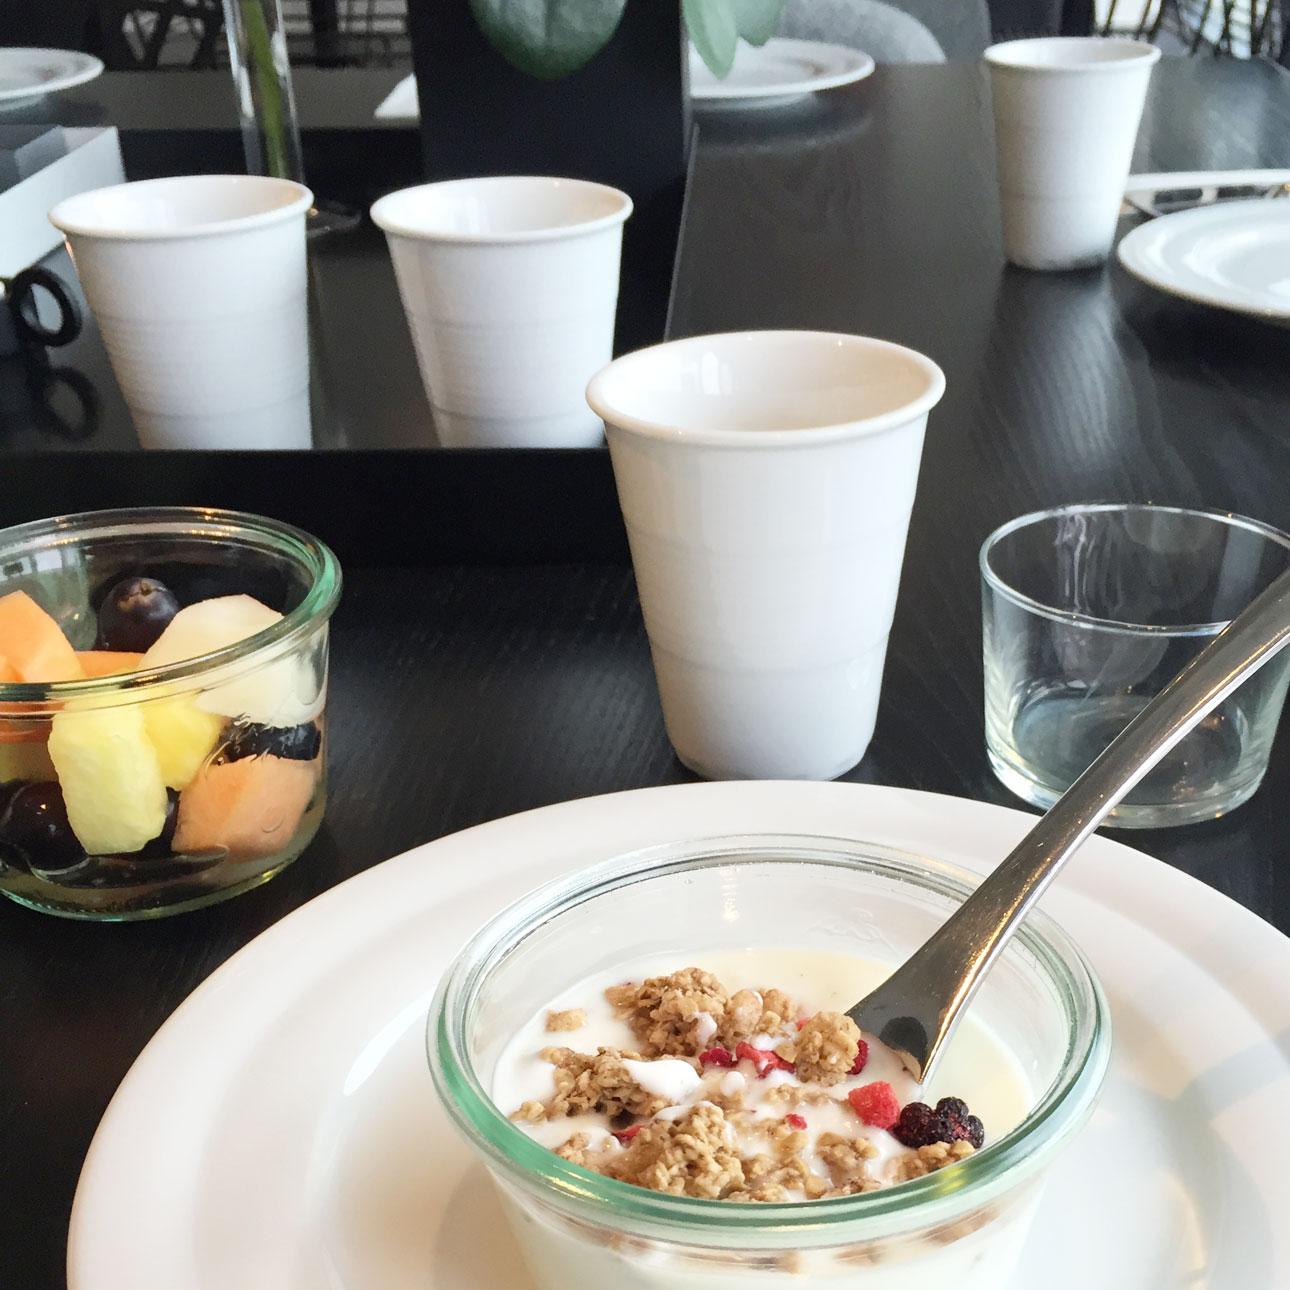 Mamalifestyle Marike augustus 2015 ontbijt STAY